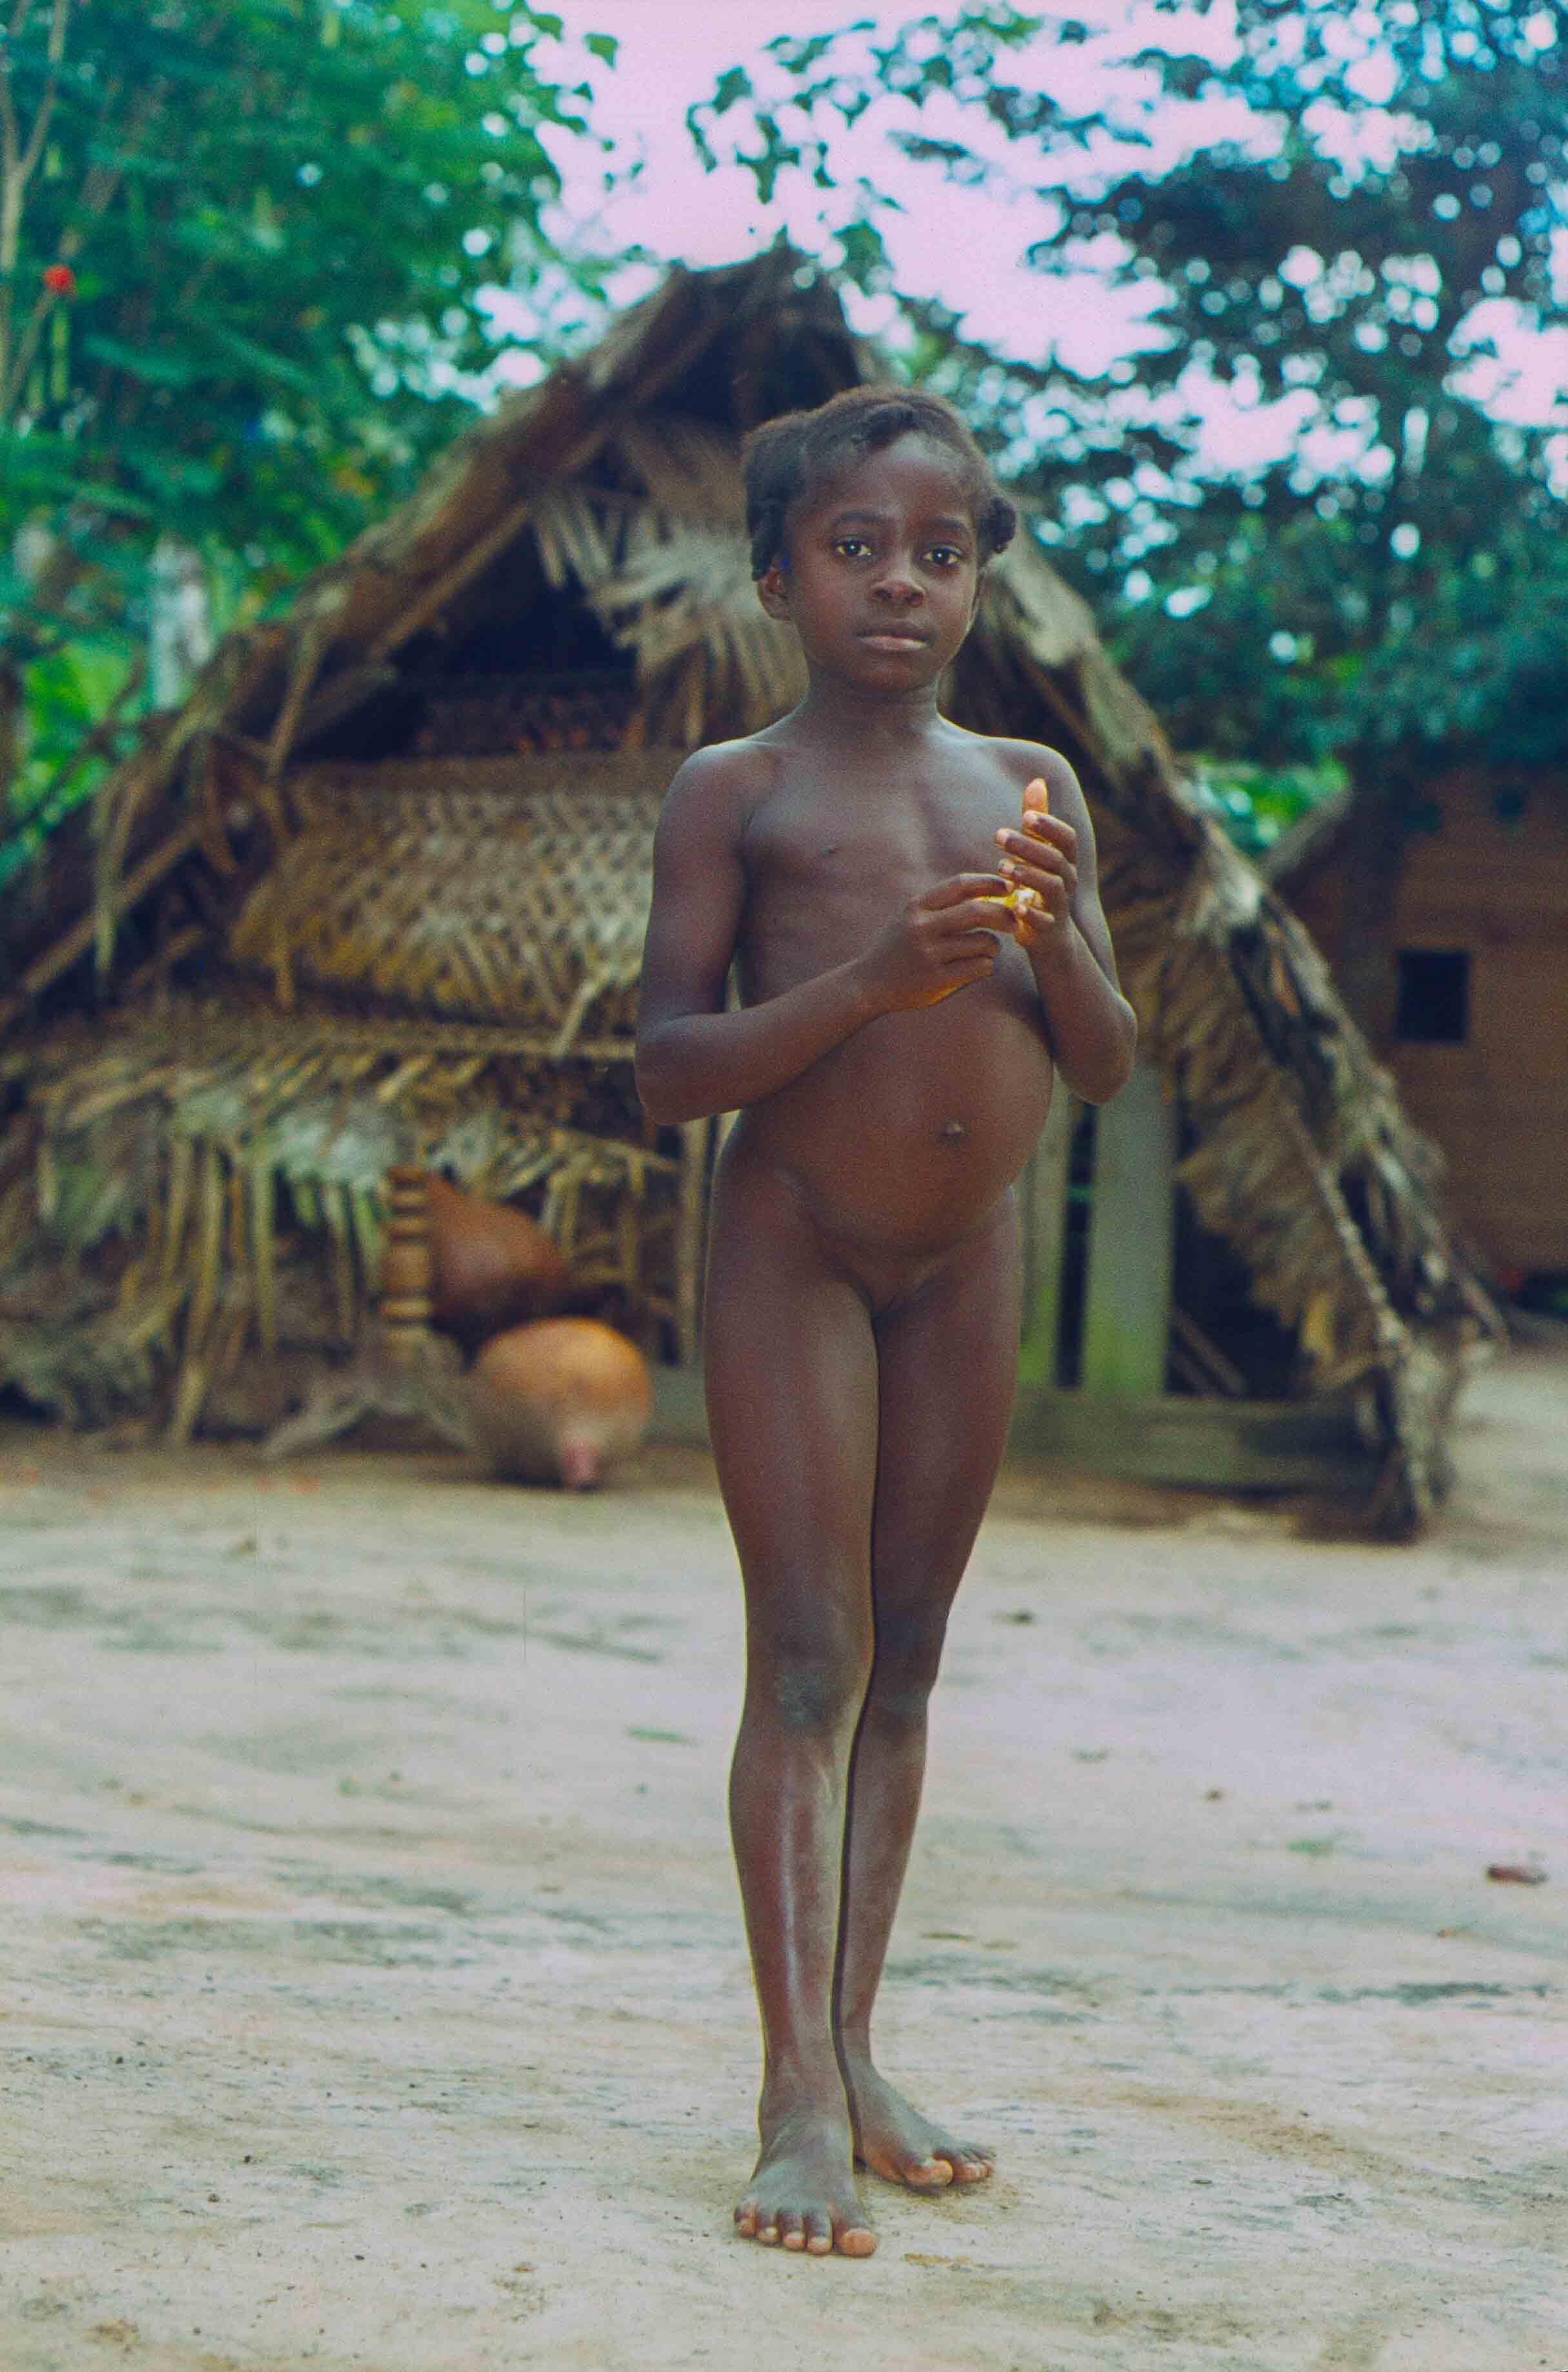 484. Suriname